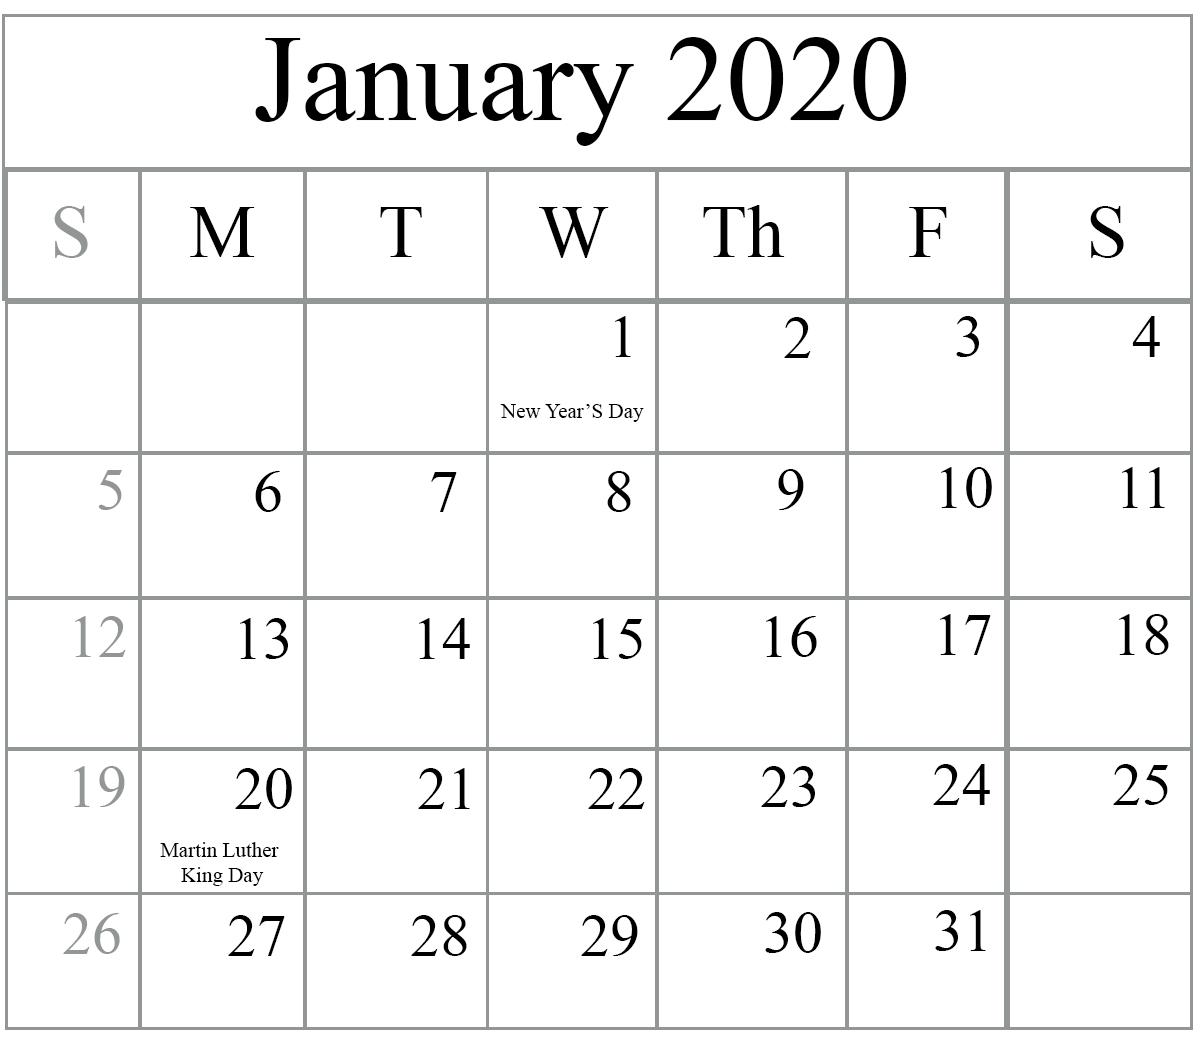 Free Blank January 2020 Calendar Printable In Pdf, Word, Excel Calendar You Can Edit